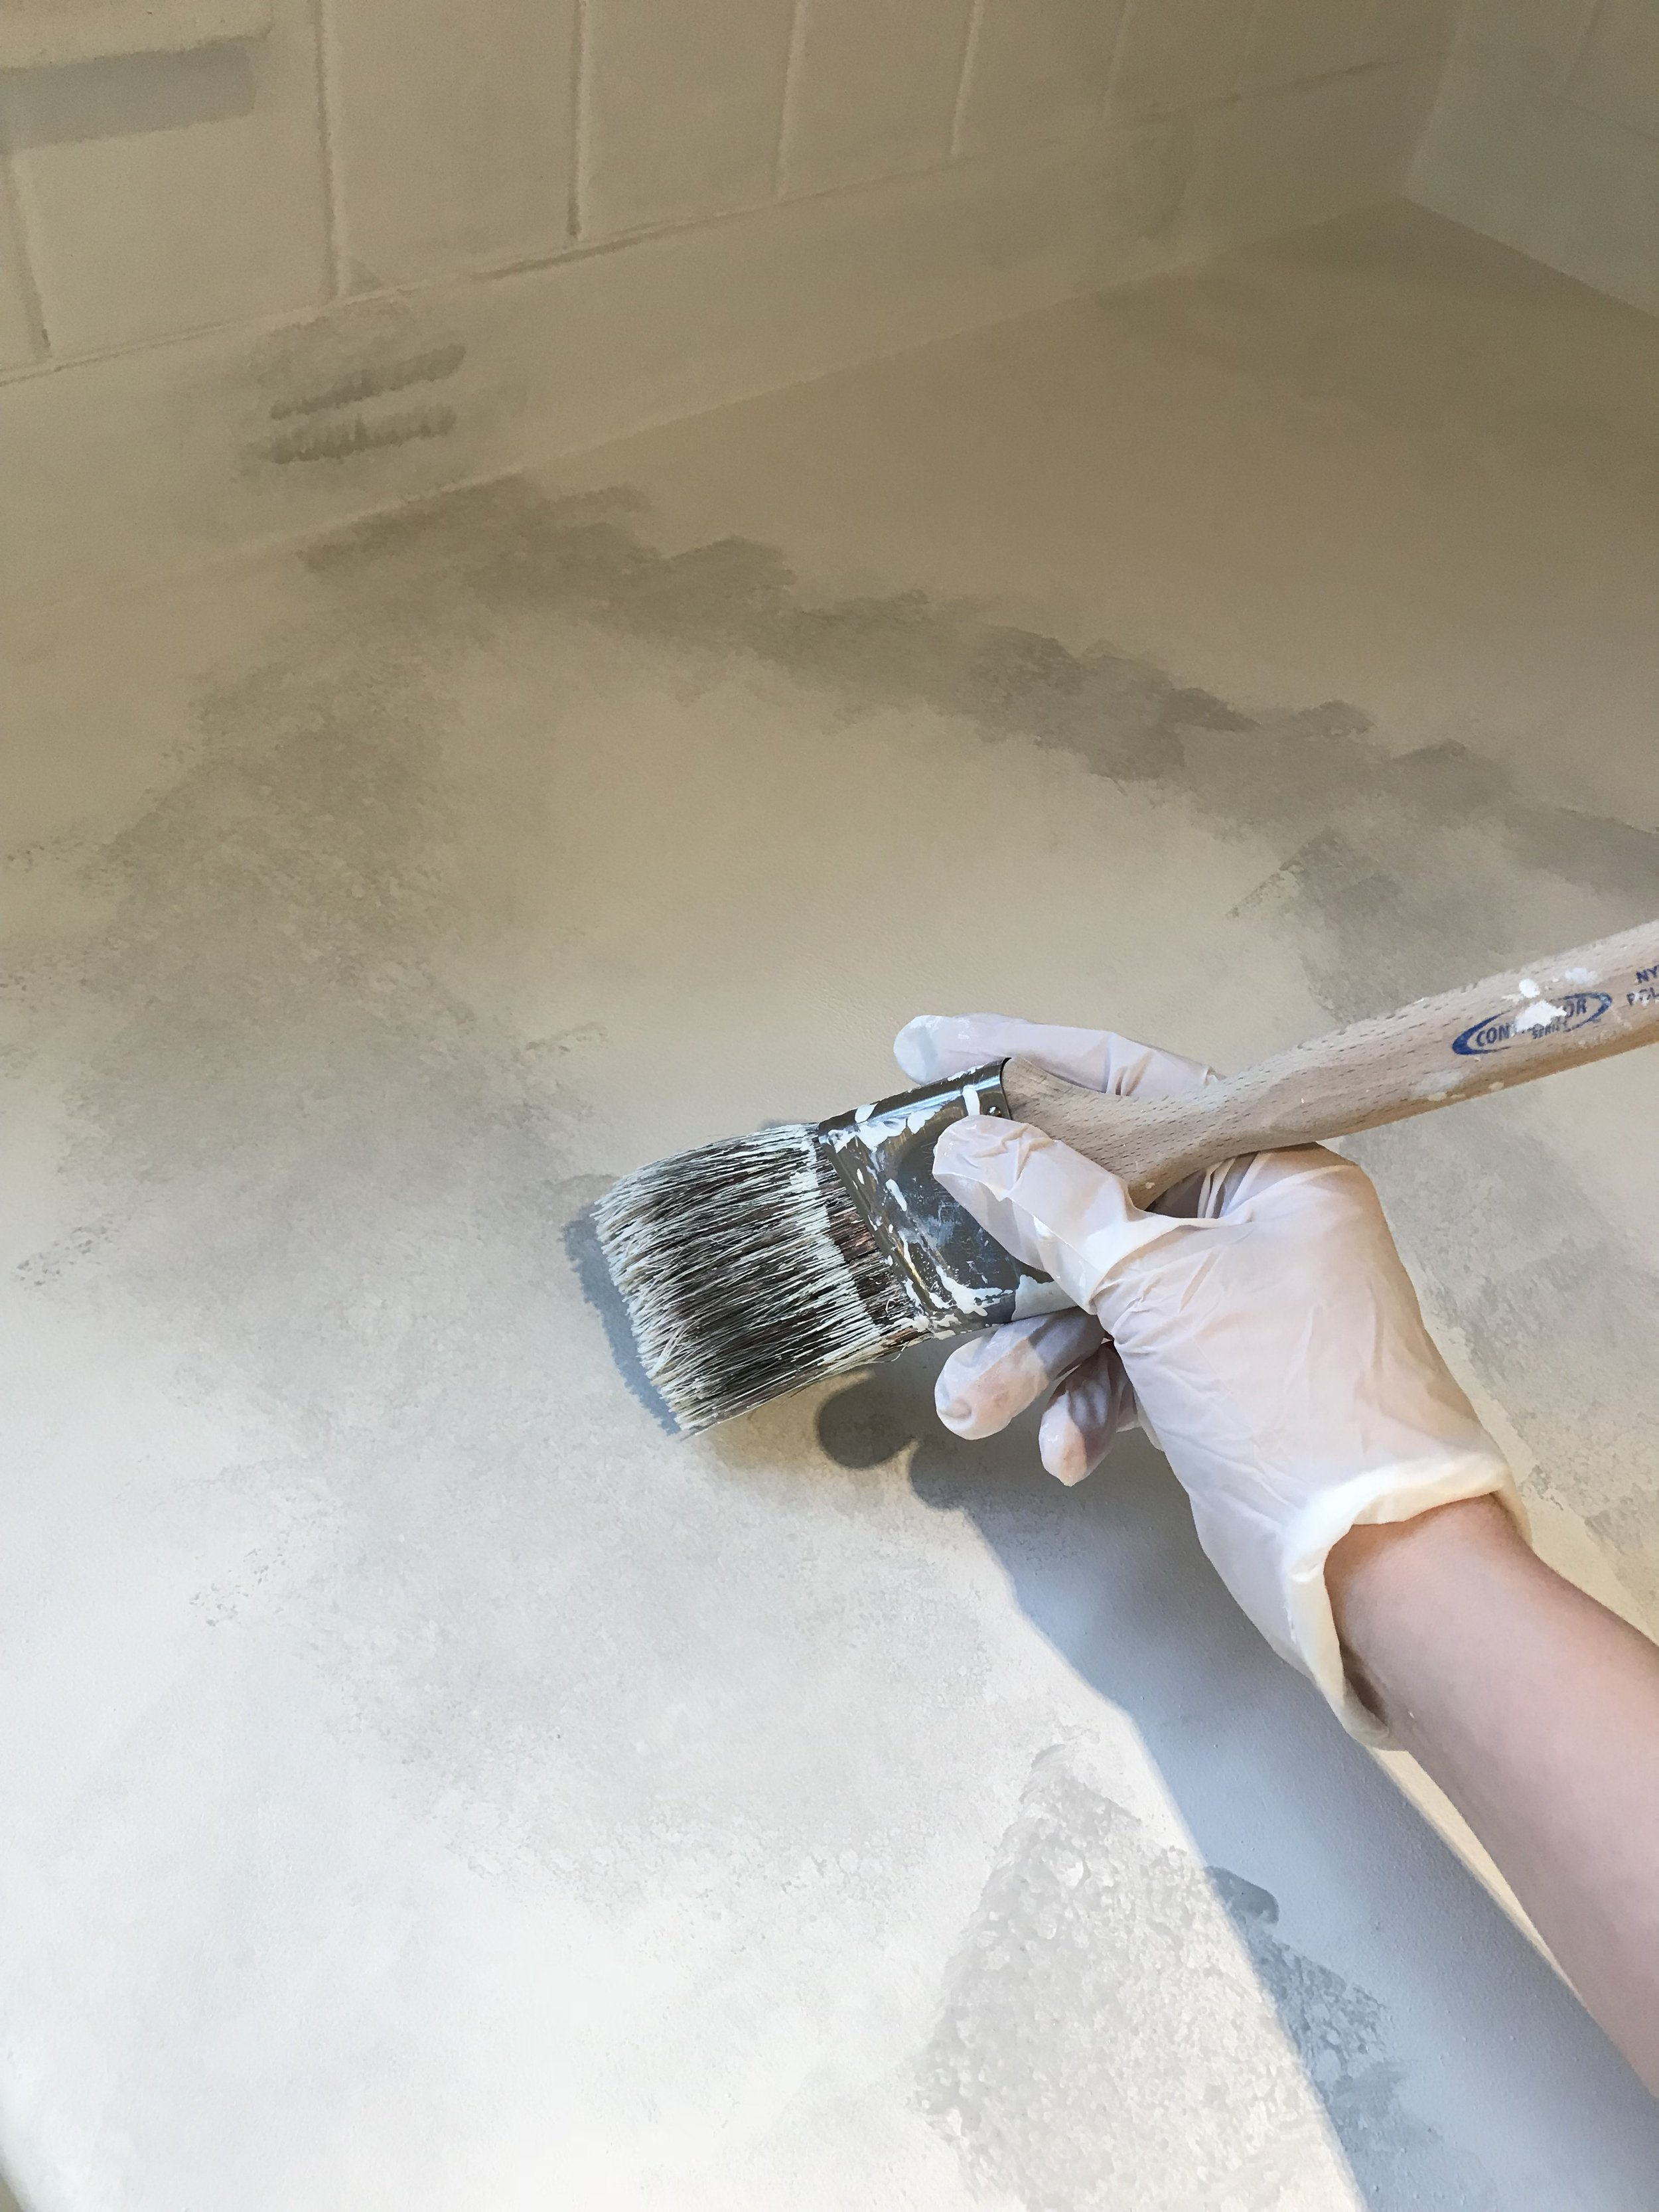 Dry brushing the sponge texture away